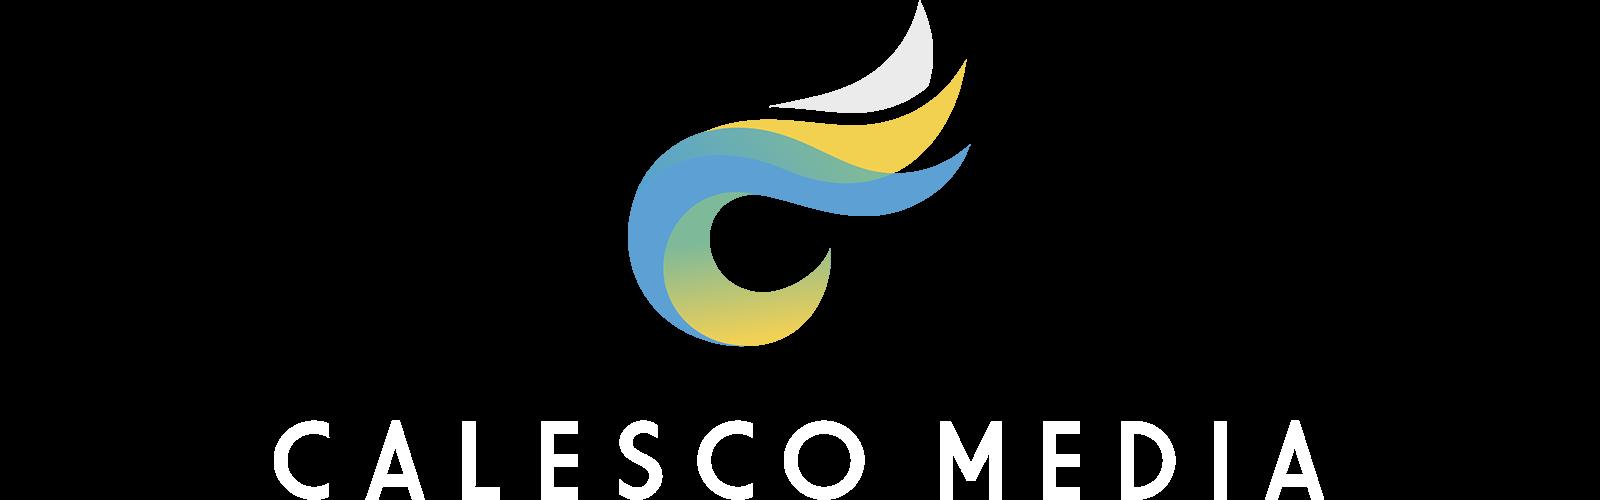 Calesco Media